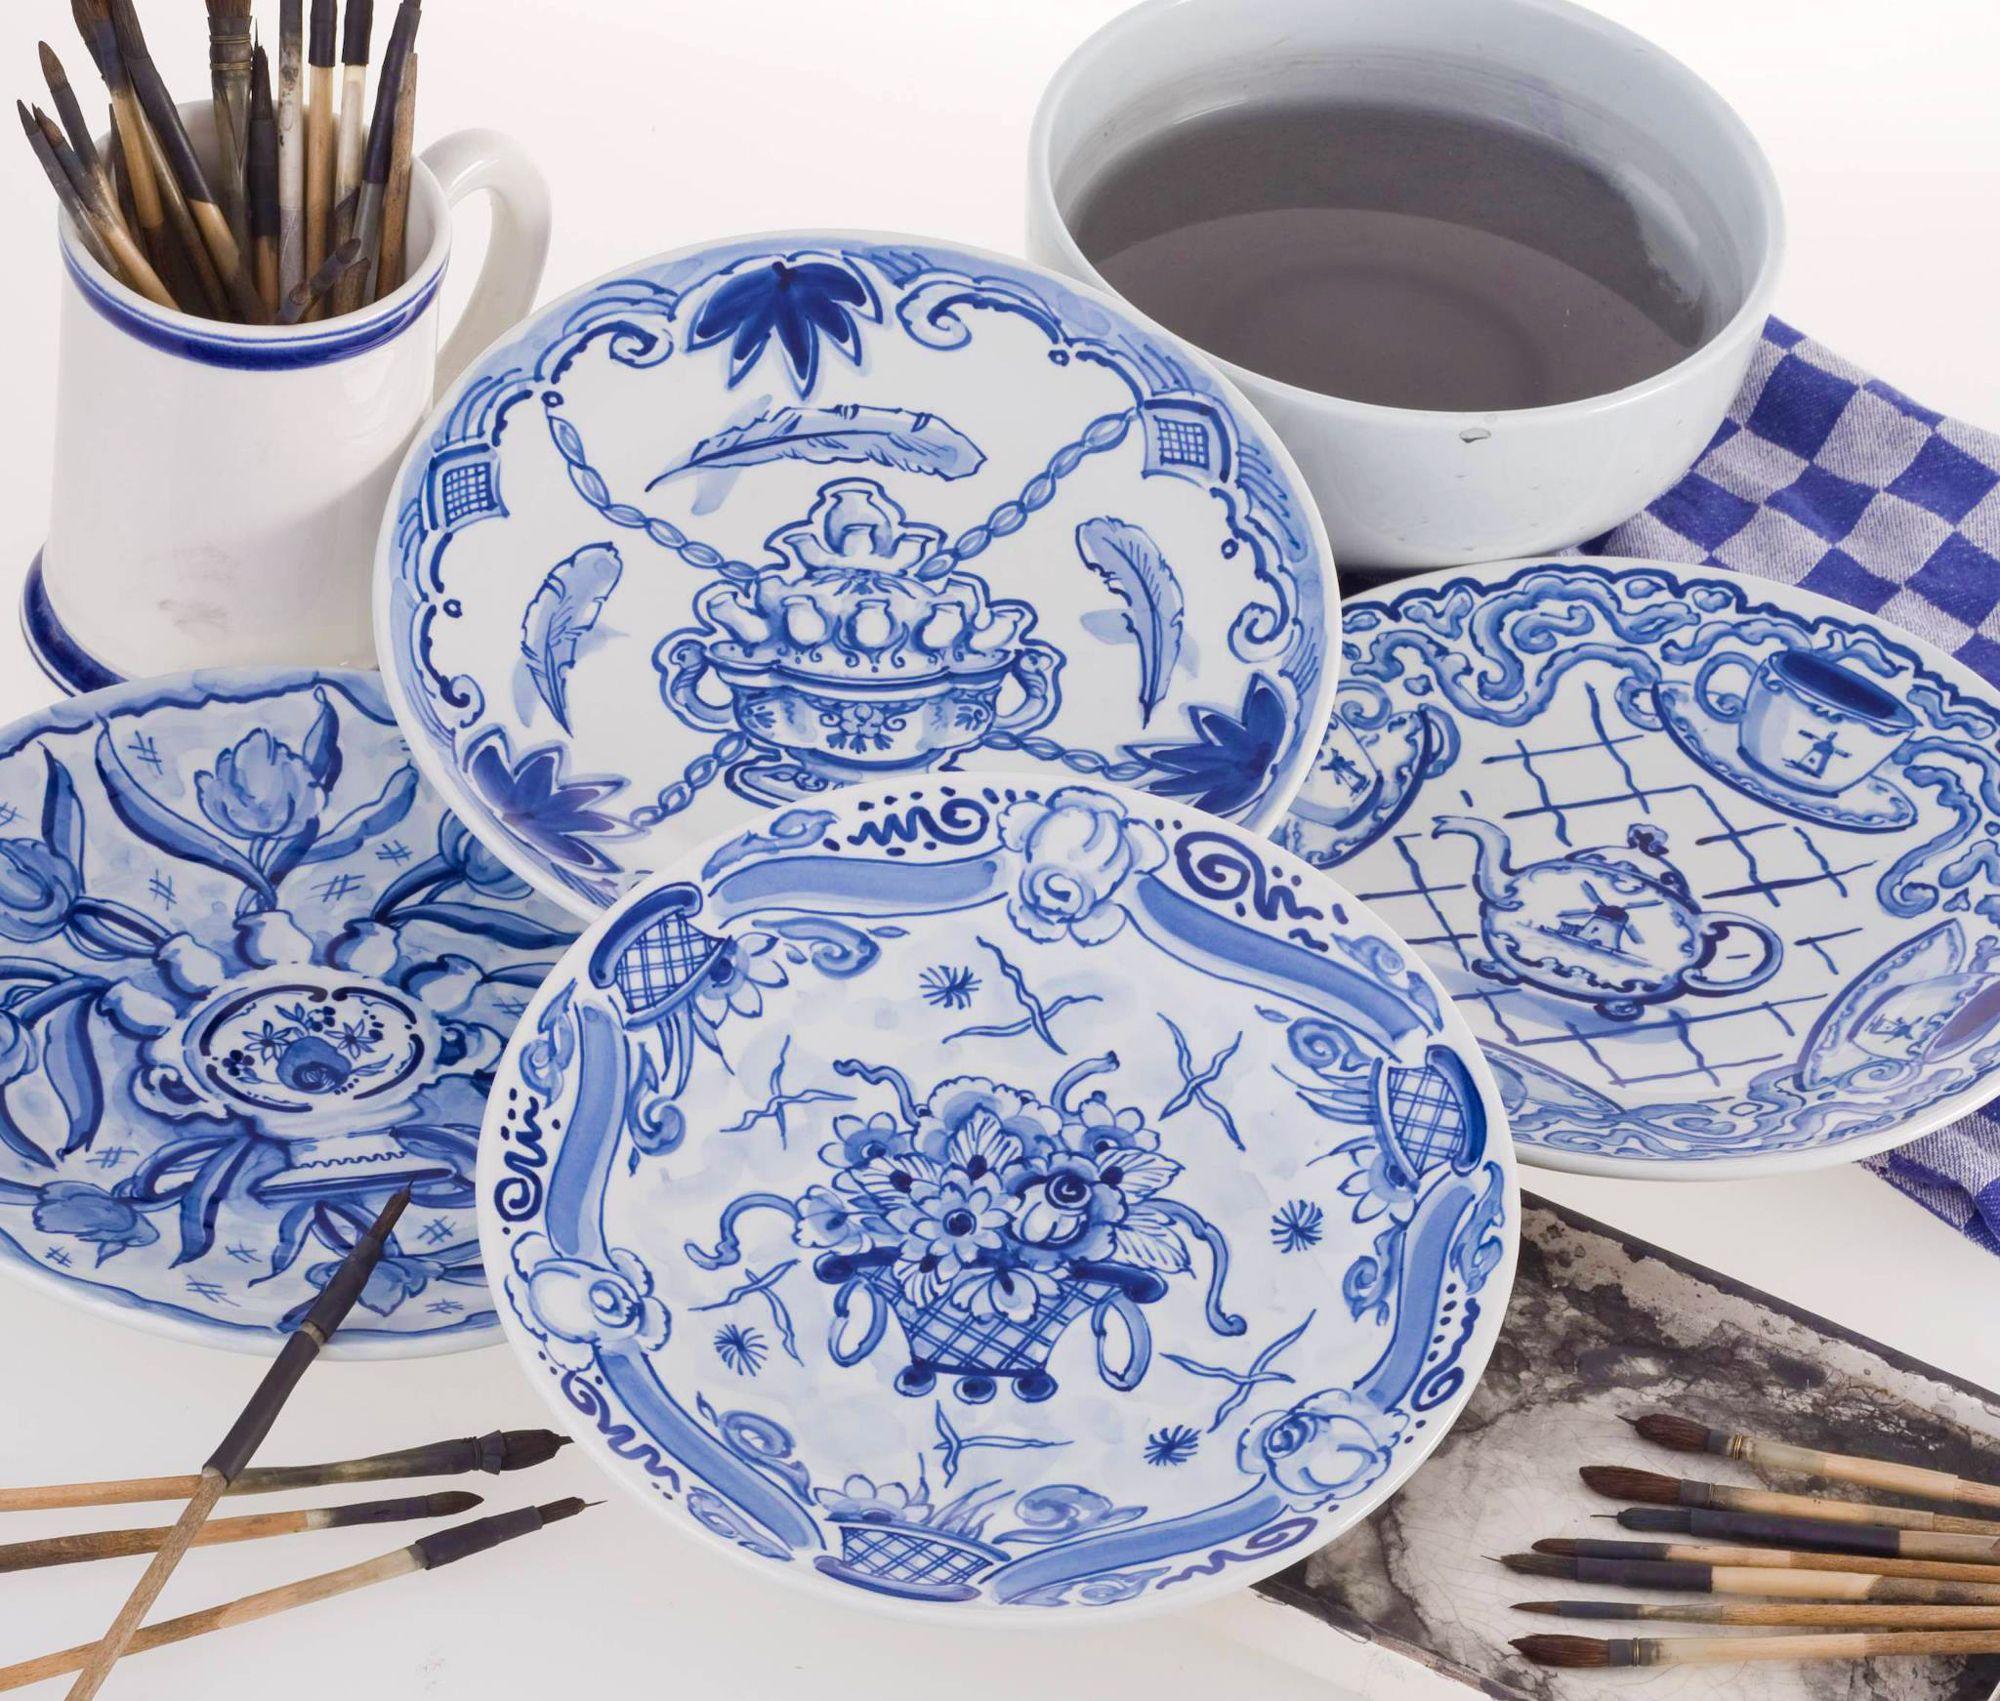 Servies Borden Set.Delfts Blauw Porselein Servies Borden Blue And White